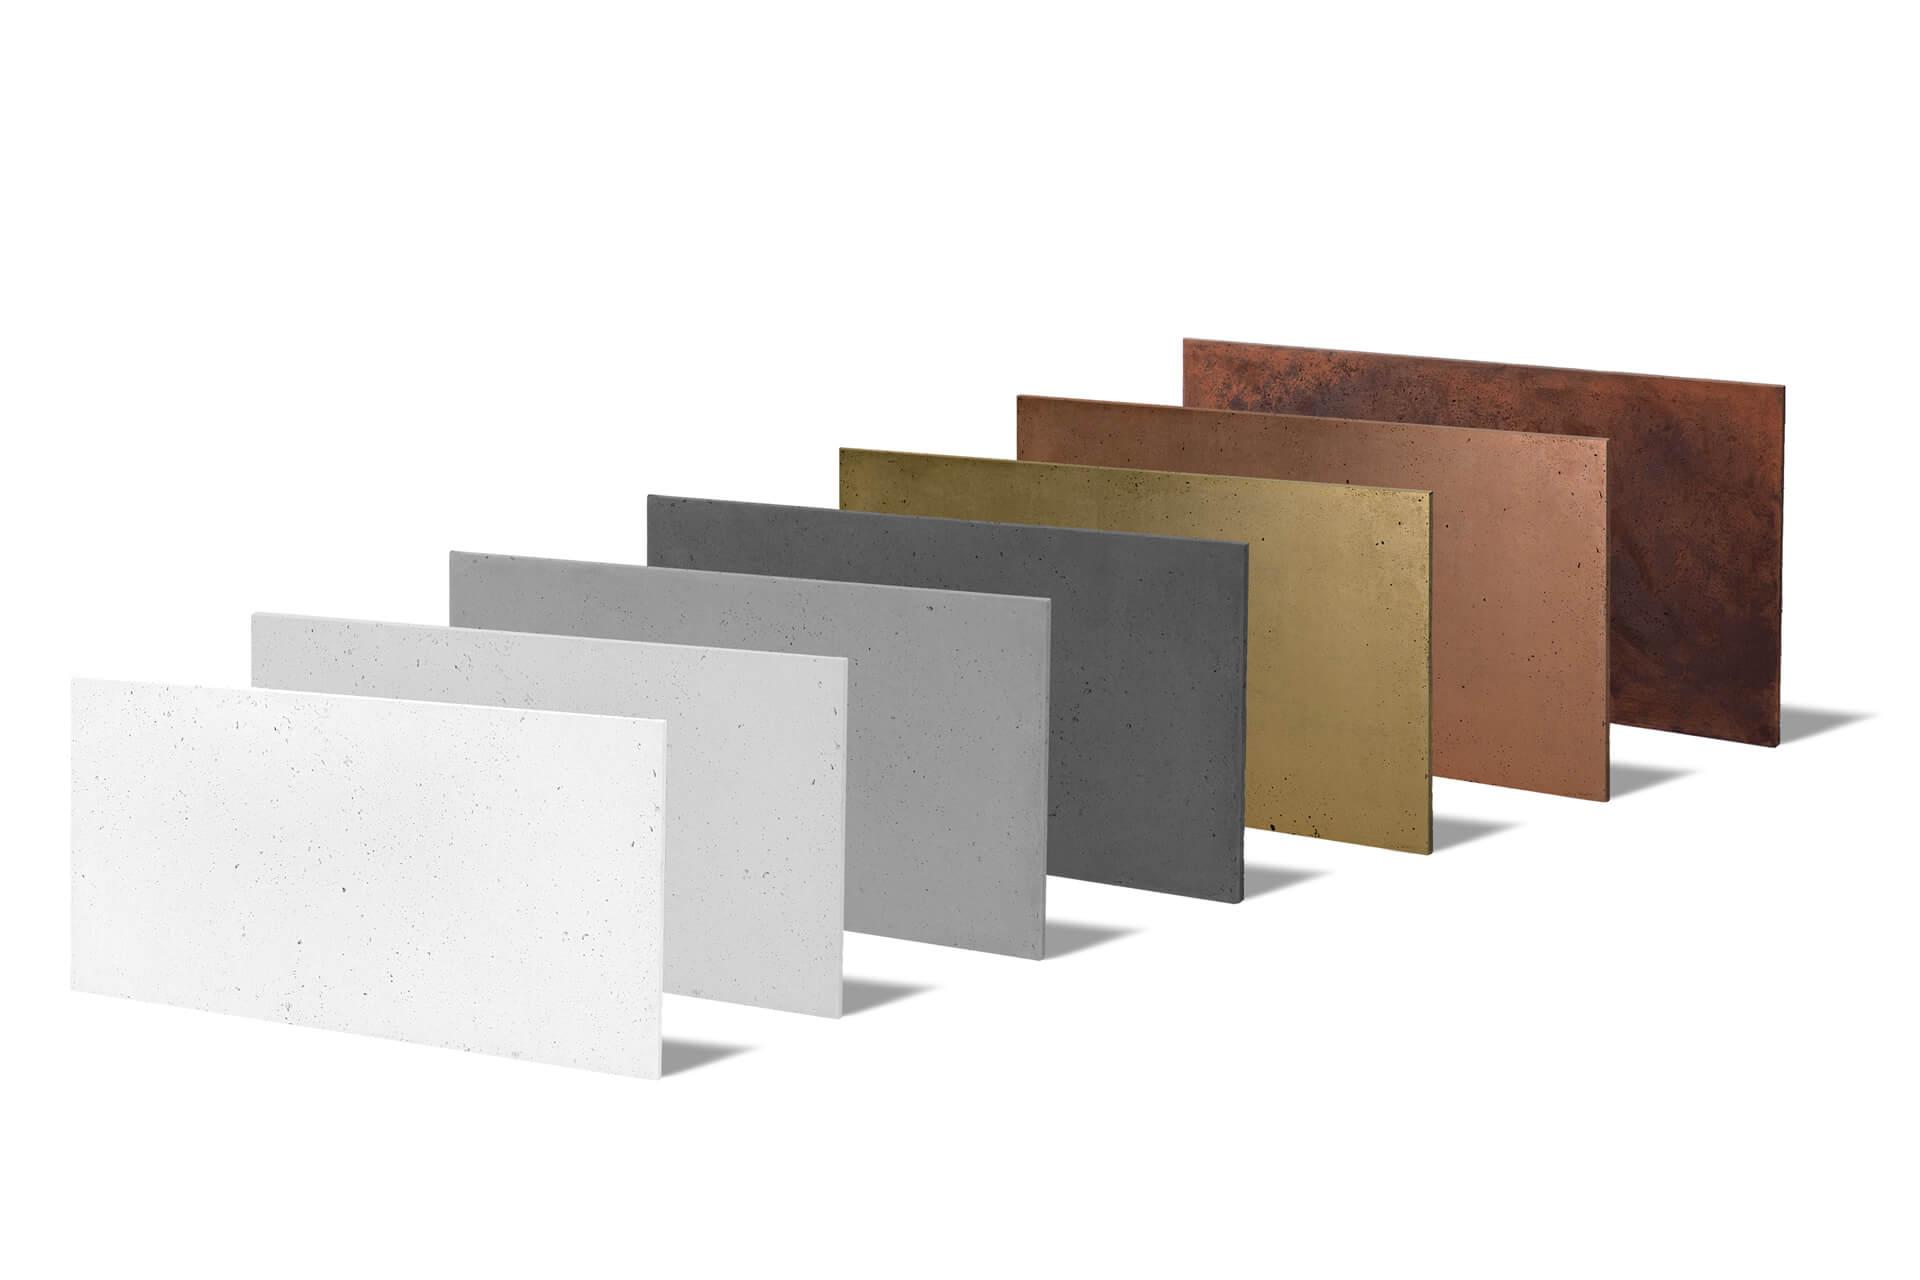 płyta beton architektoniczny seria bt